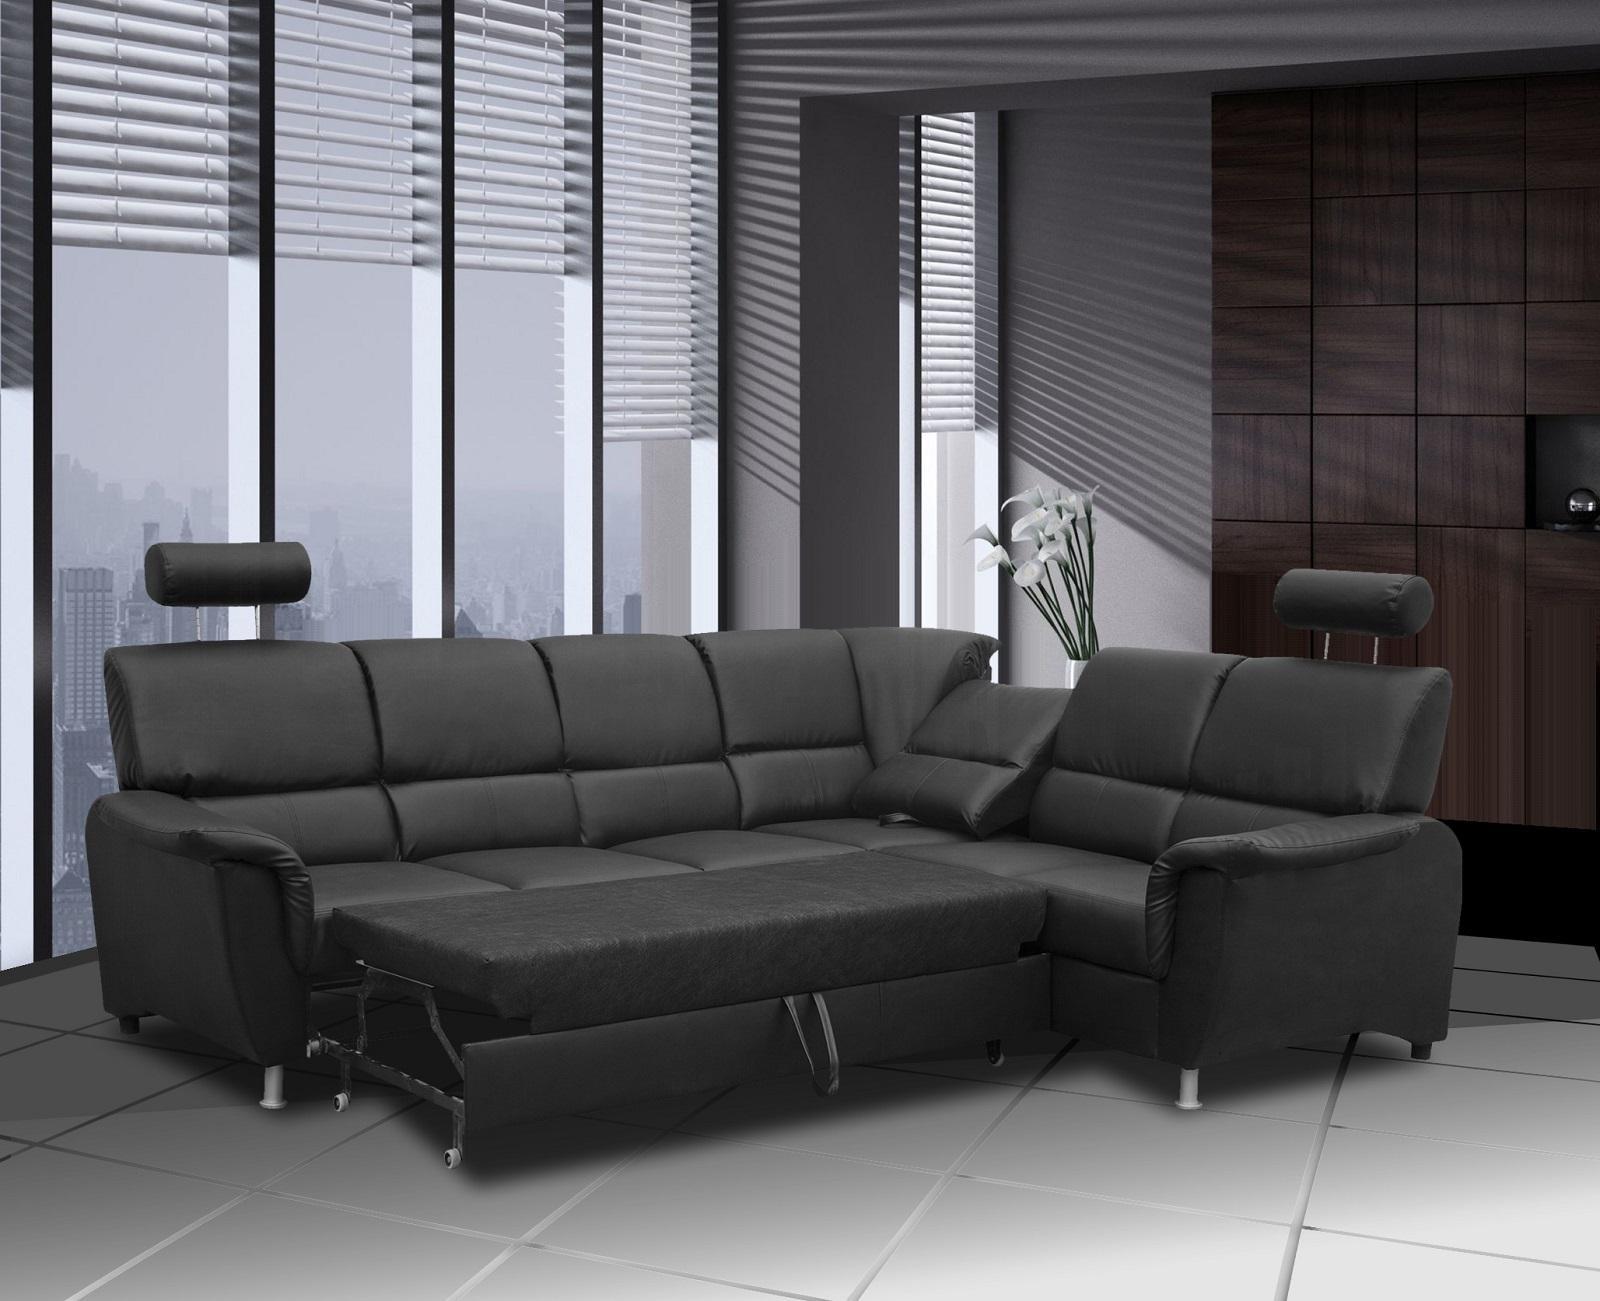 sofa sleeper san francisco broyhill sectional covers 20 photos sofas diego ideas